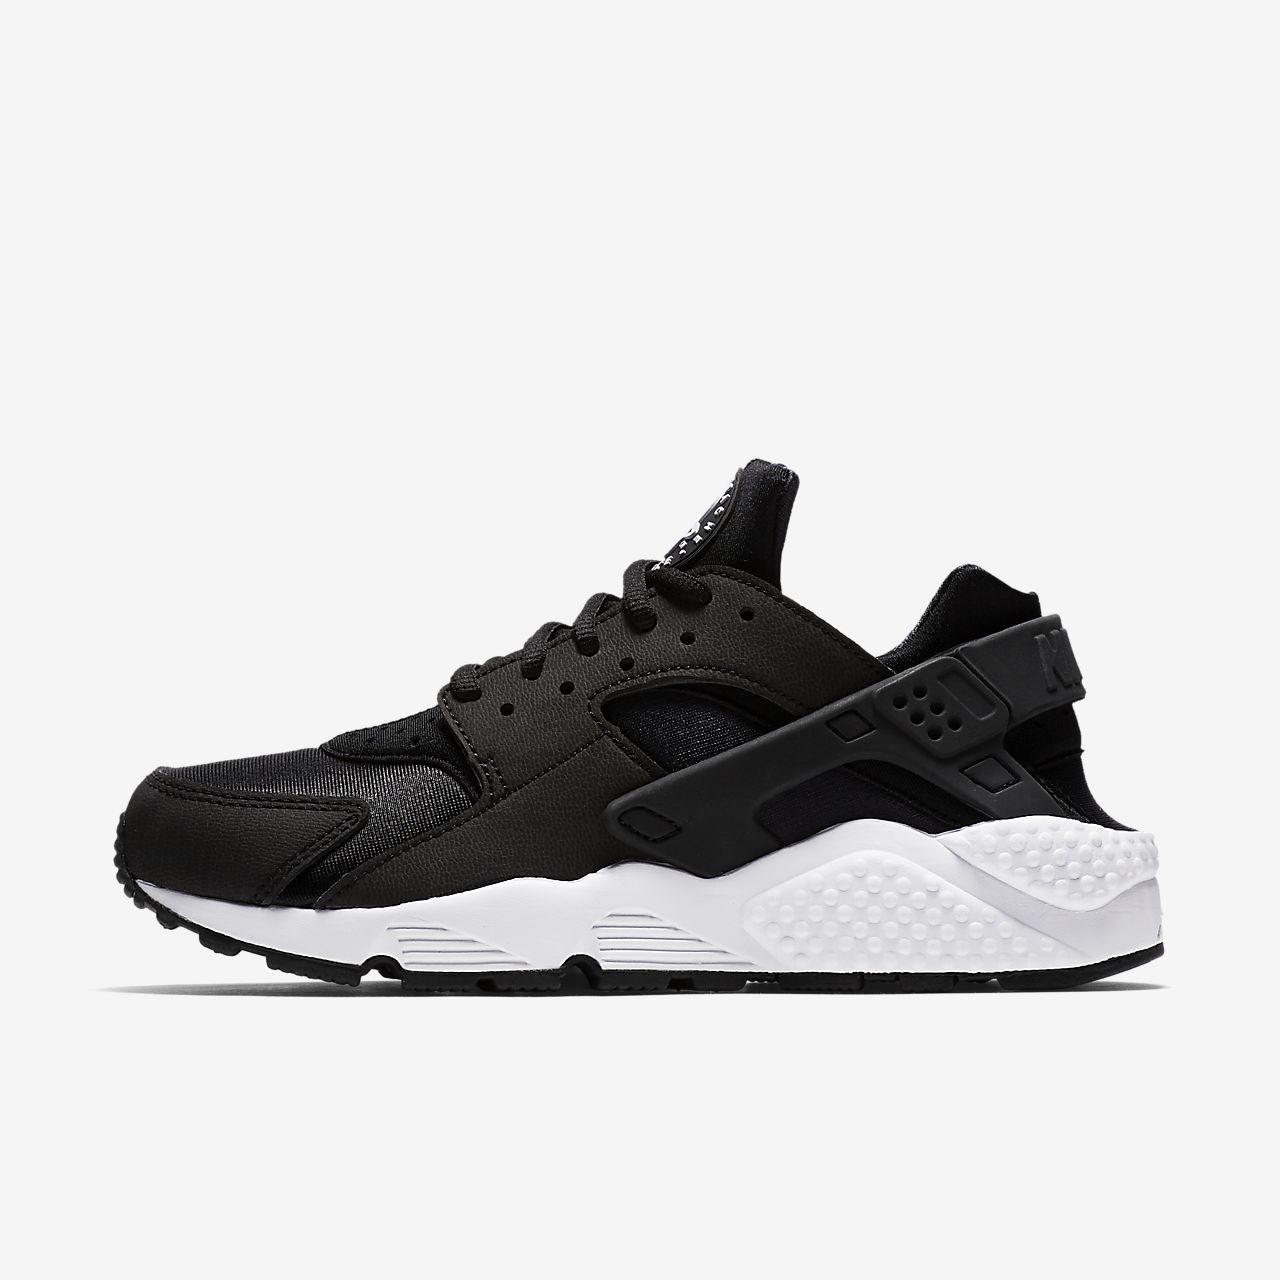 size 40 0e5ef f478f ... Chaussure Nike Air Huarache pour Femme